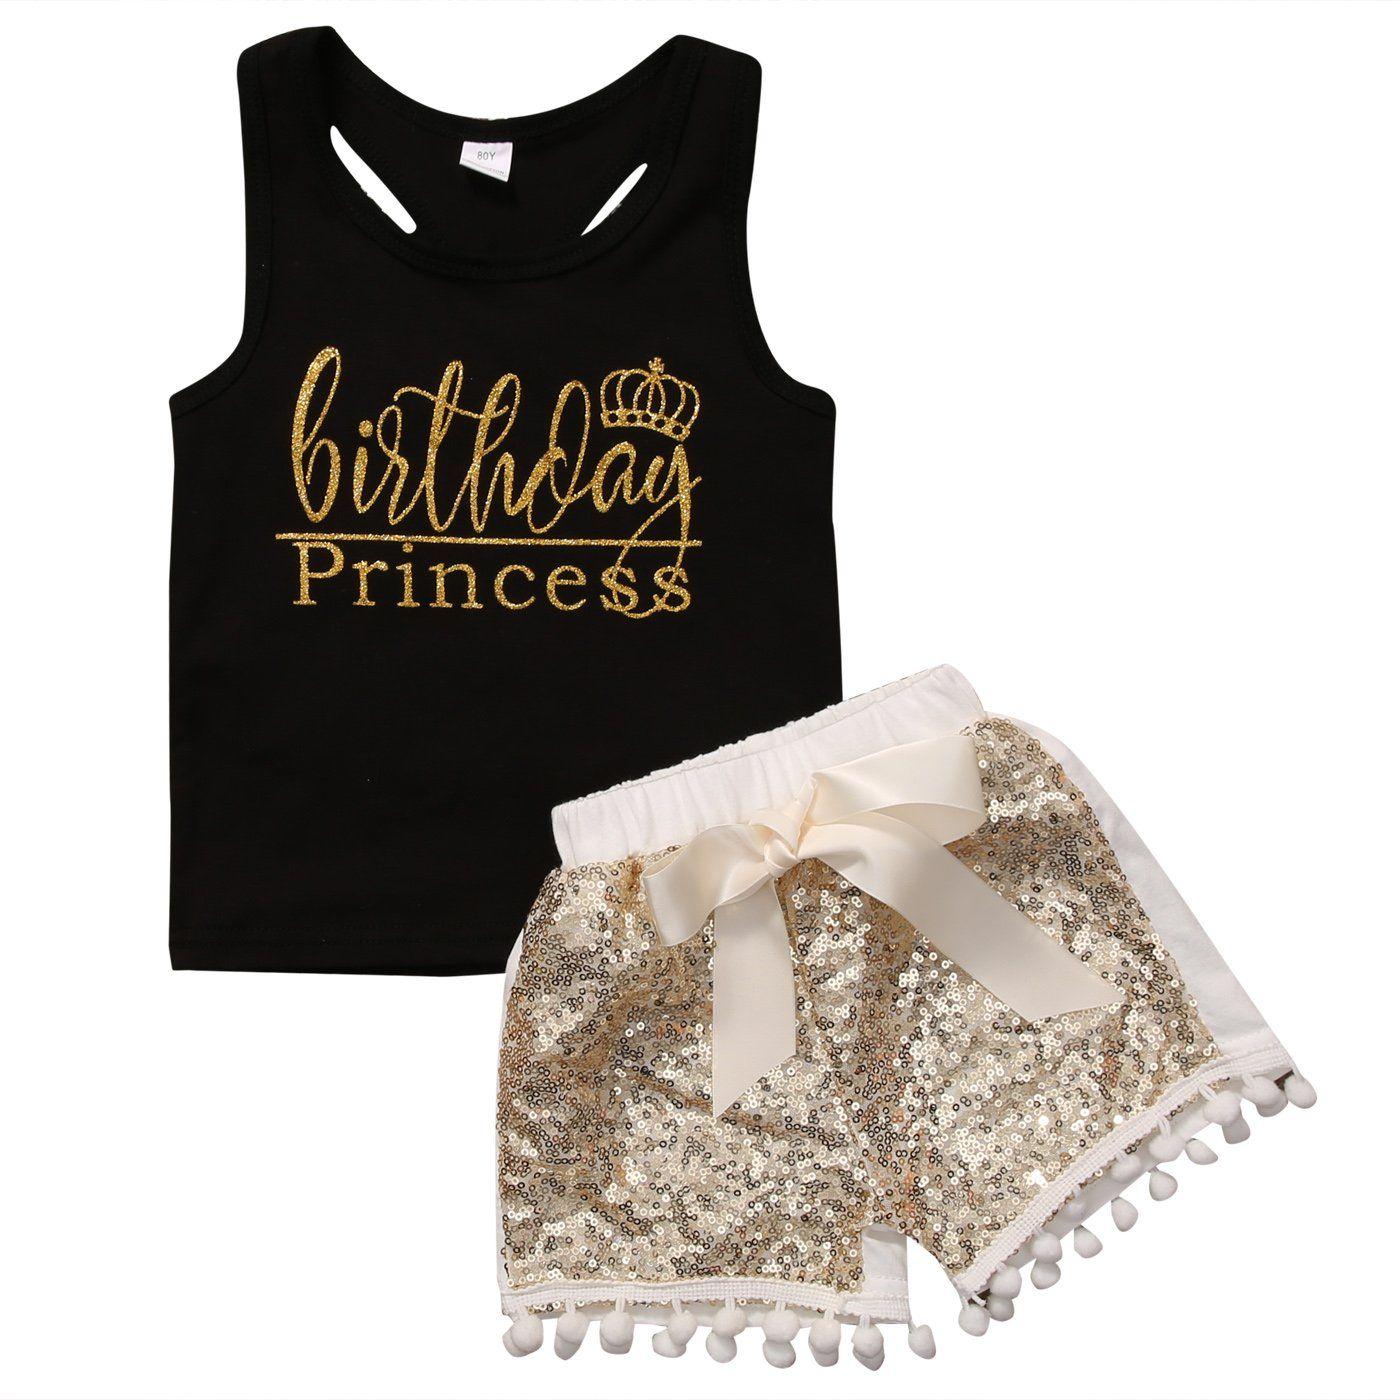 45c938df3b 2Pcs Toddler Baby Girl Kids Letters Tank T-shirt Tops + Sequin ...